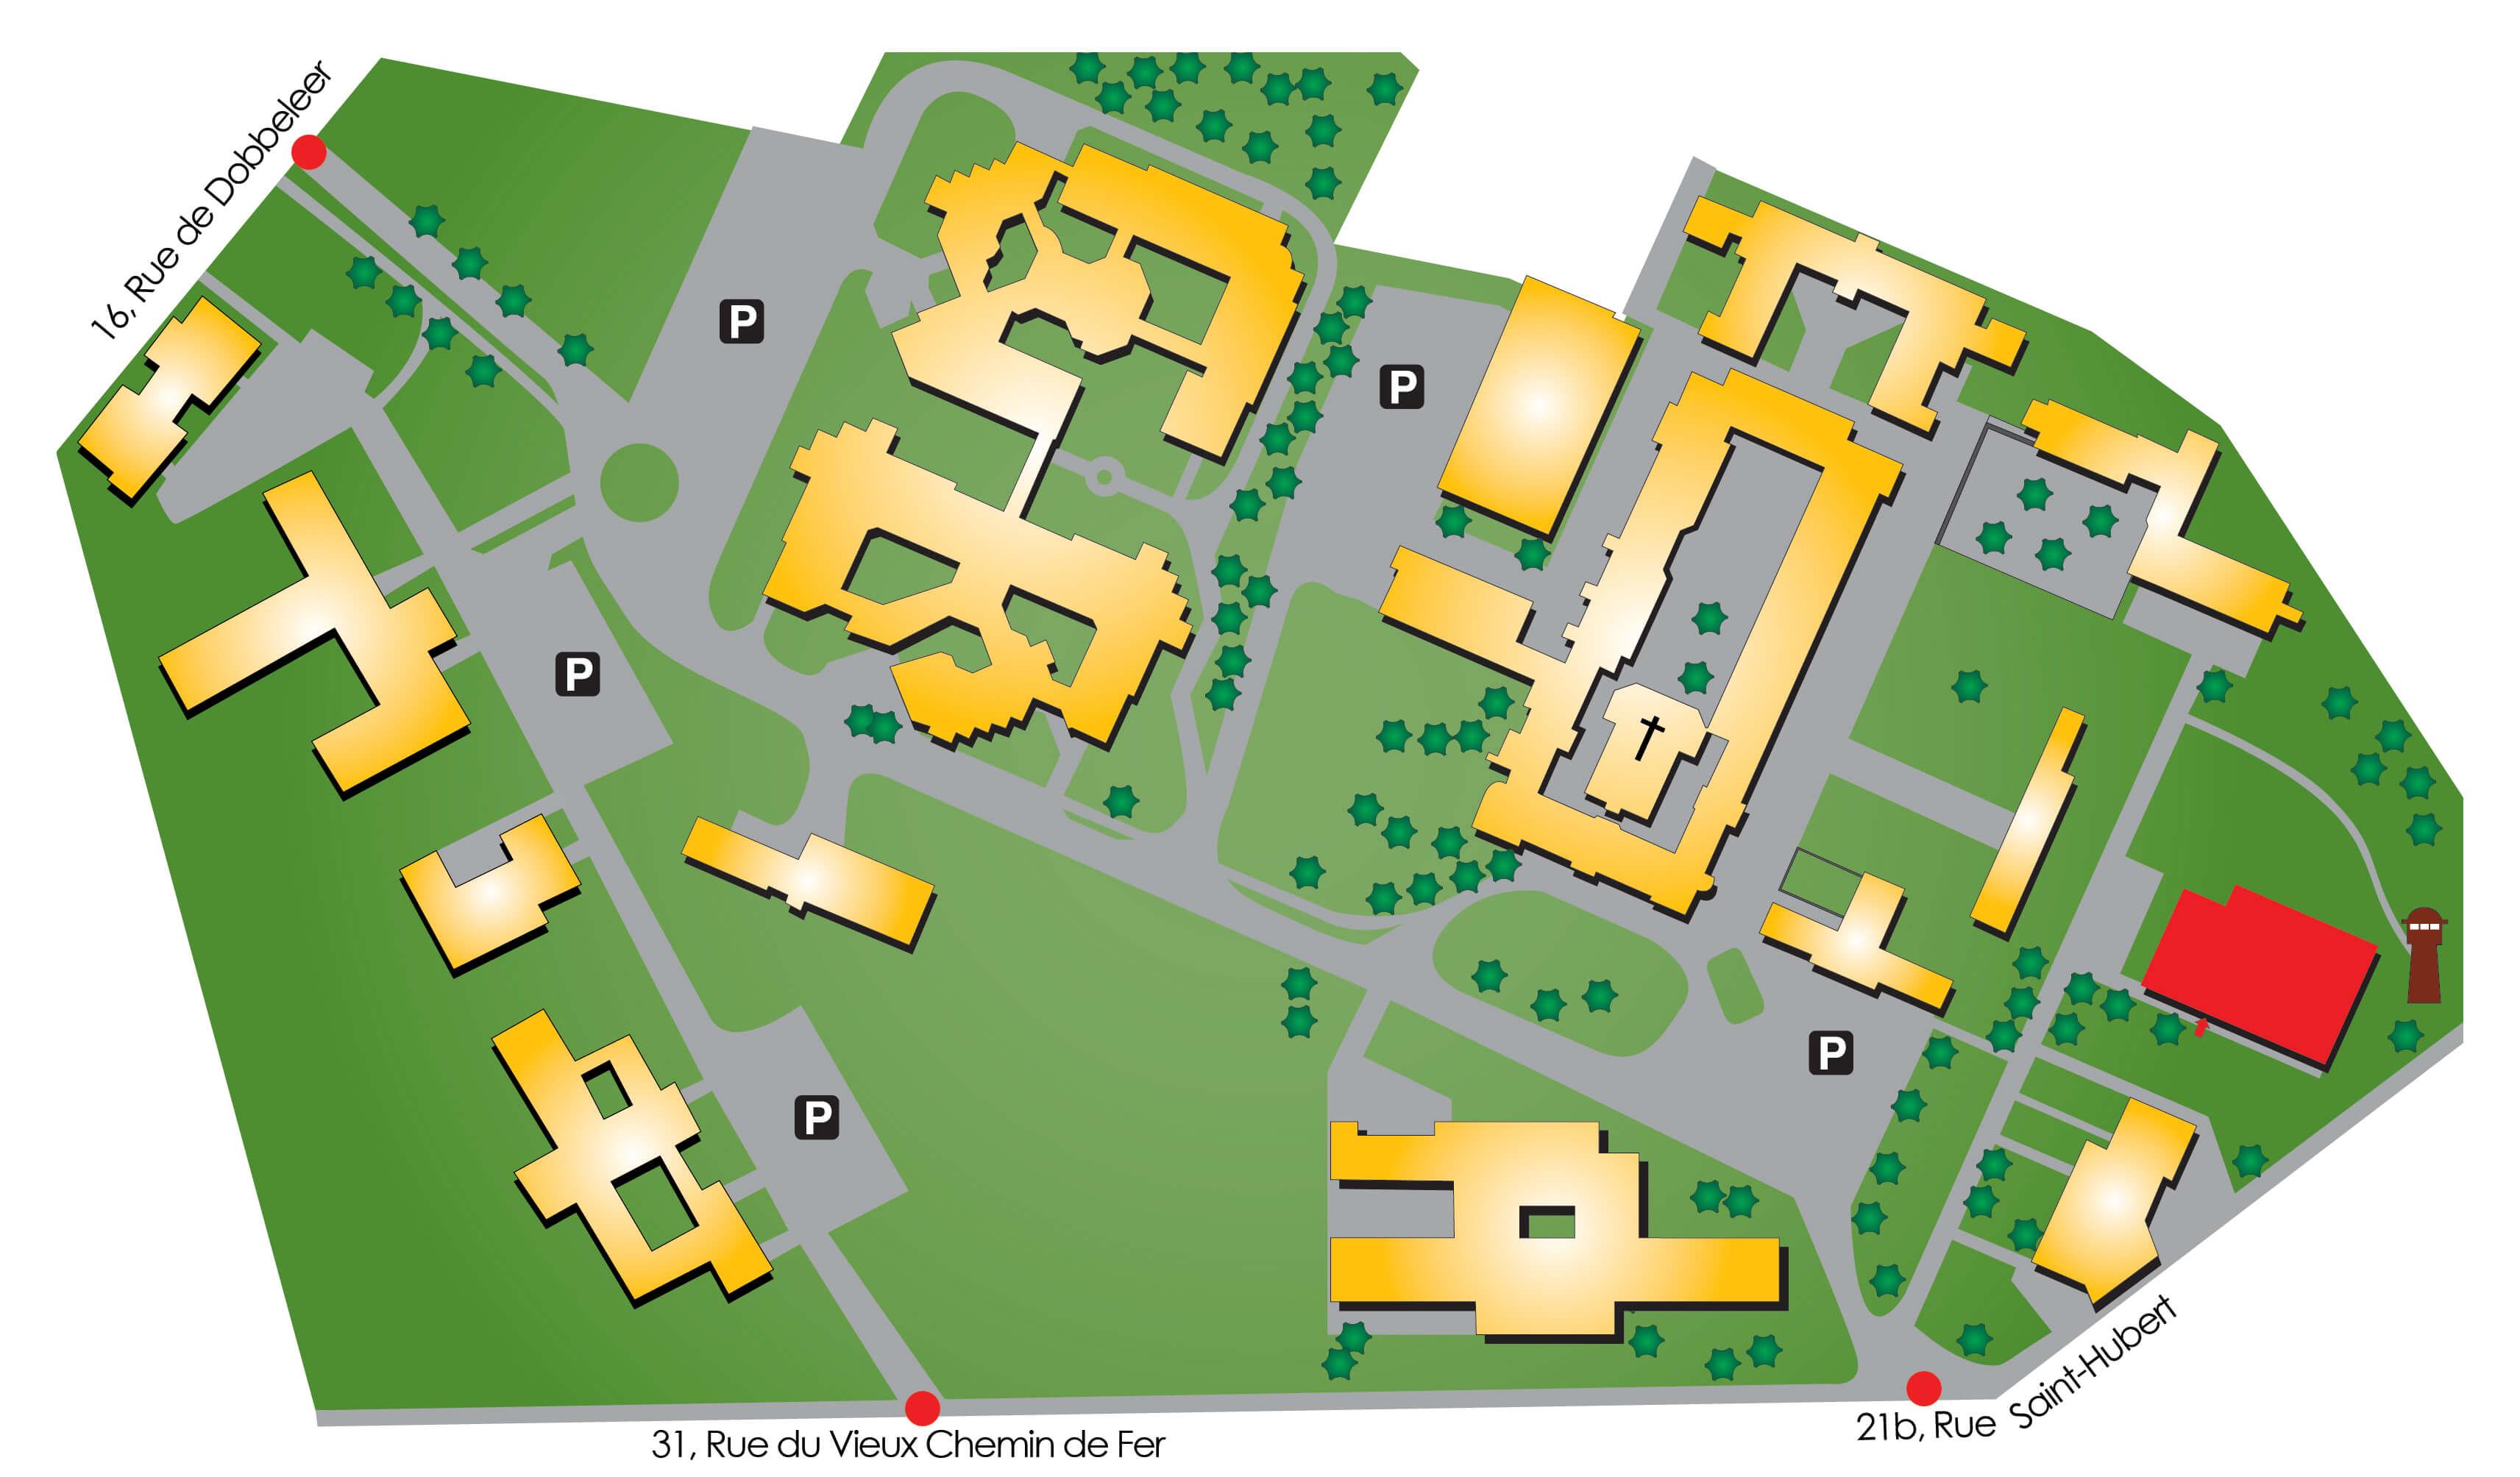 Plan d'accès hall des sports